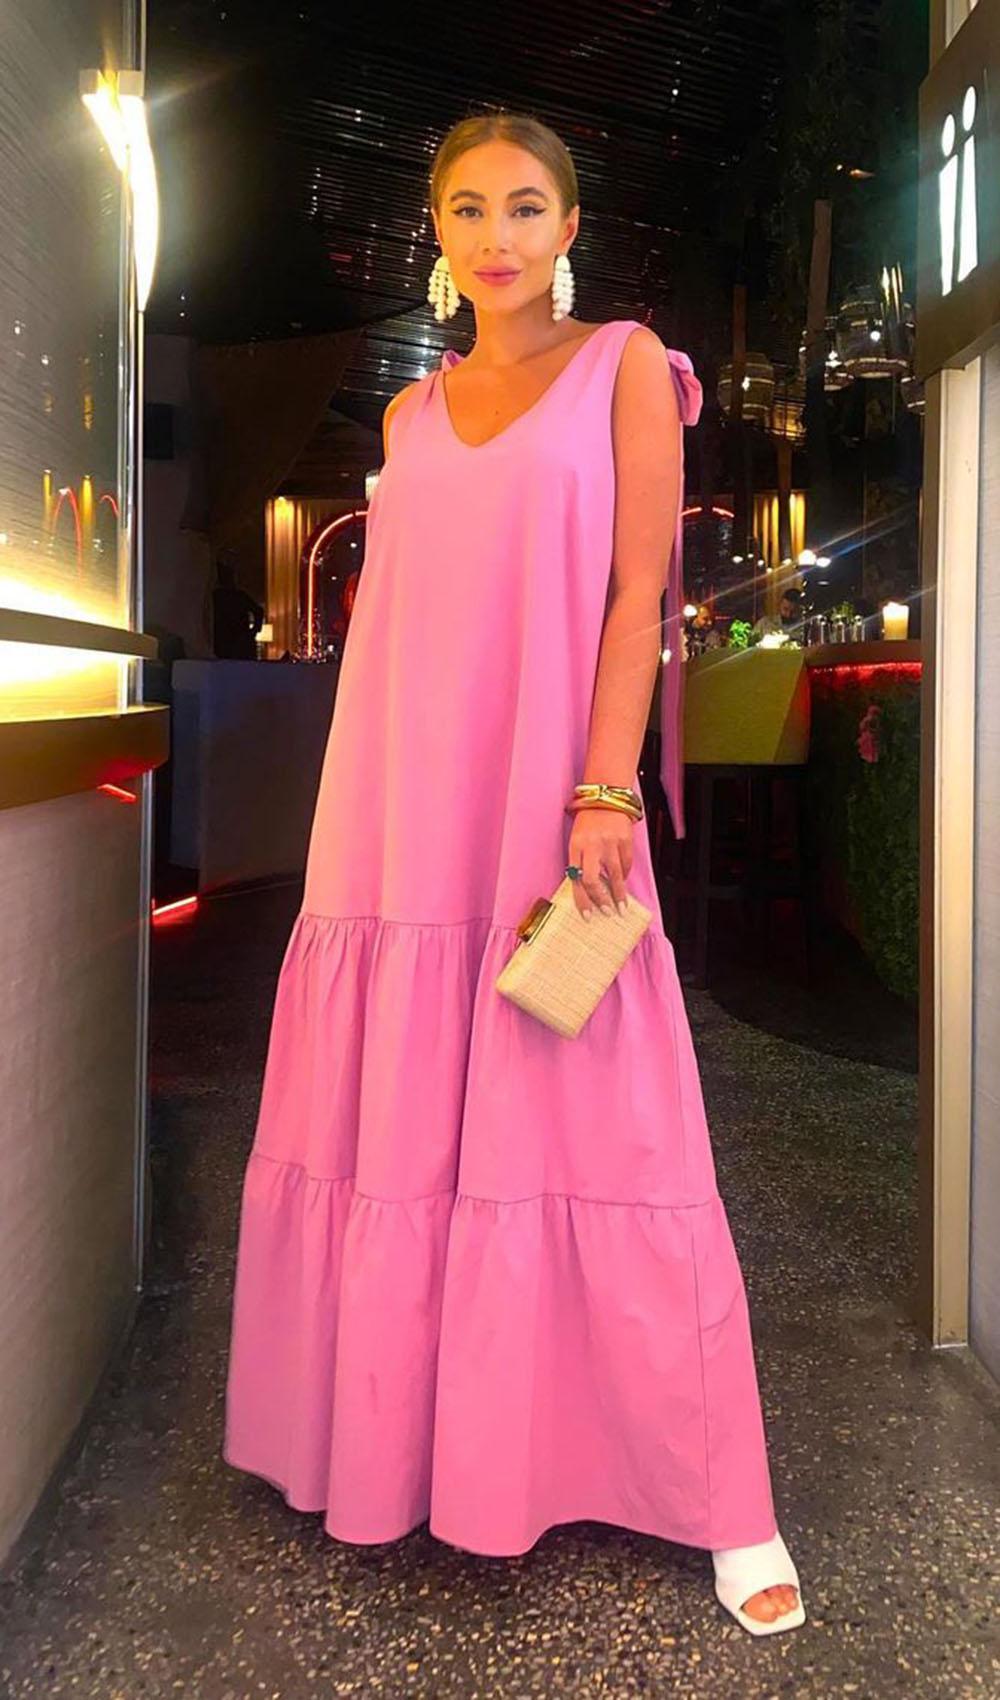 Look vestido rosa, bolsa clutch e sandália barnca pra jantar